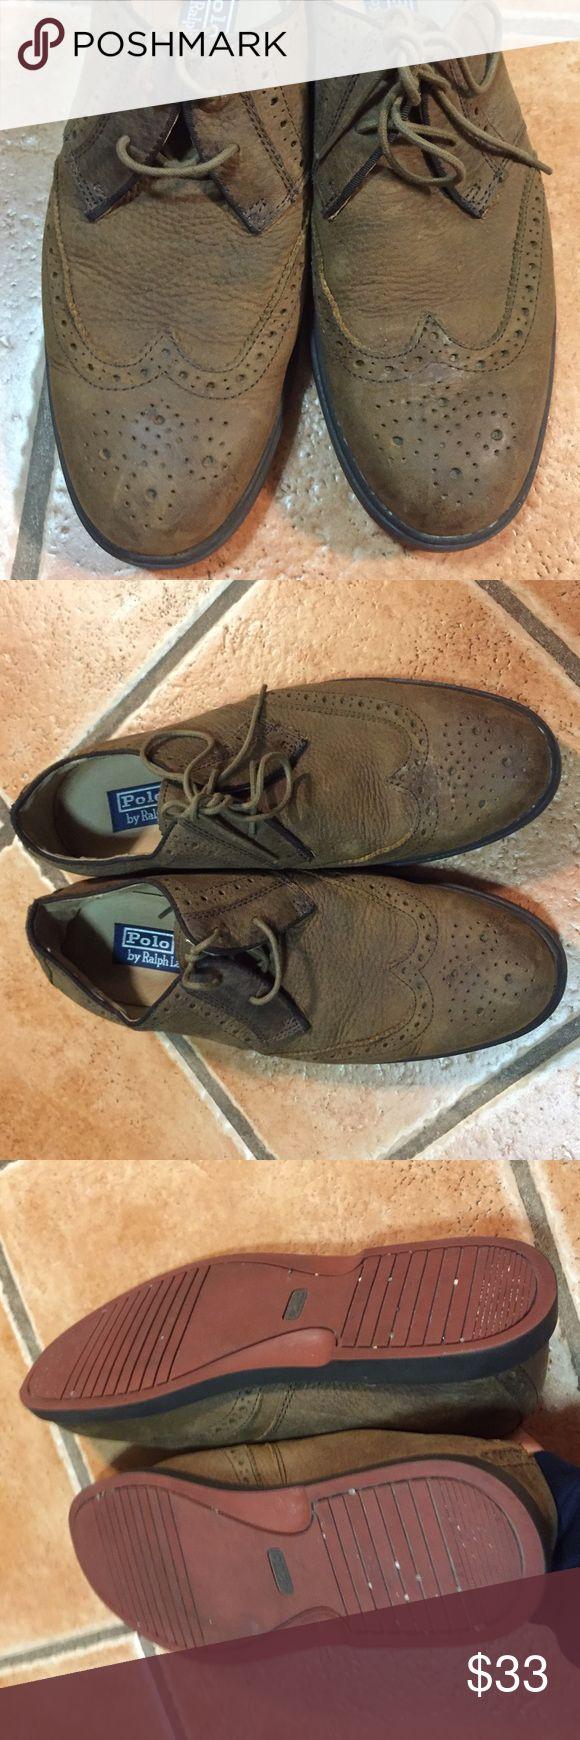 Polo Ralph Lauren Sz 8.5 orrick wingtip shoes Great condition all leather except for minor deform due to storage Polo by Ralph Lauren Shoes Oxfords & Derbys